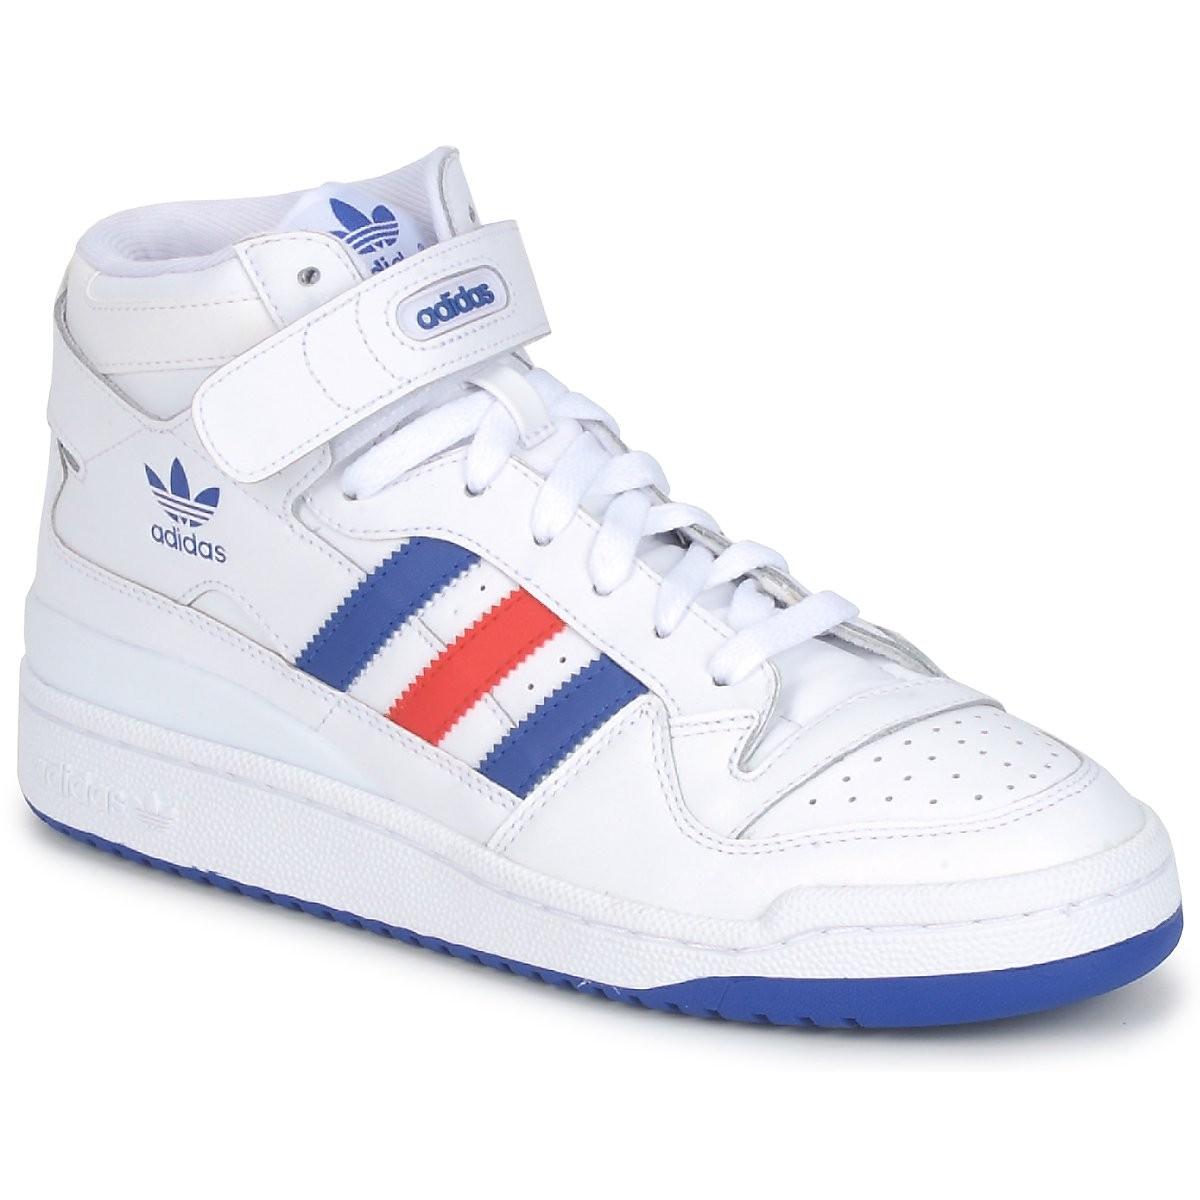 c3baf0783eb ... clearance adidas forum mens mid top. white d101d e1226